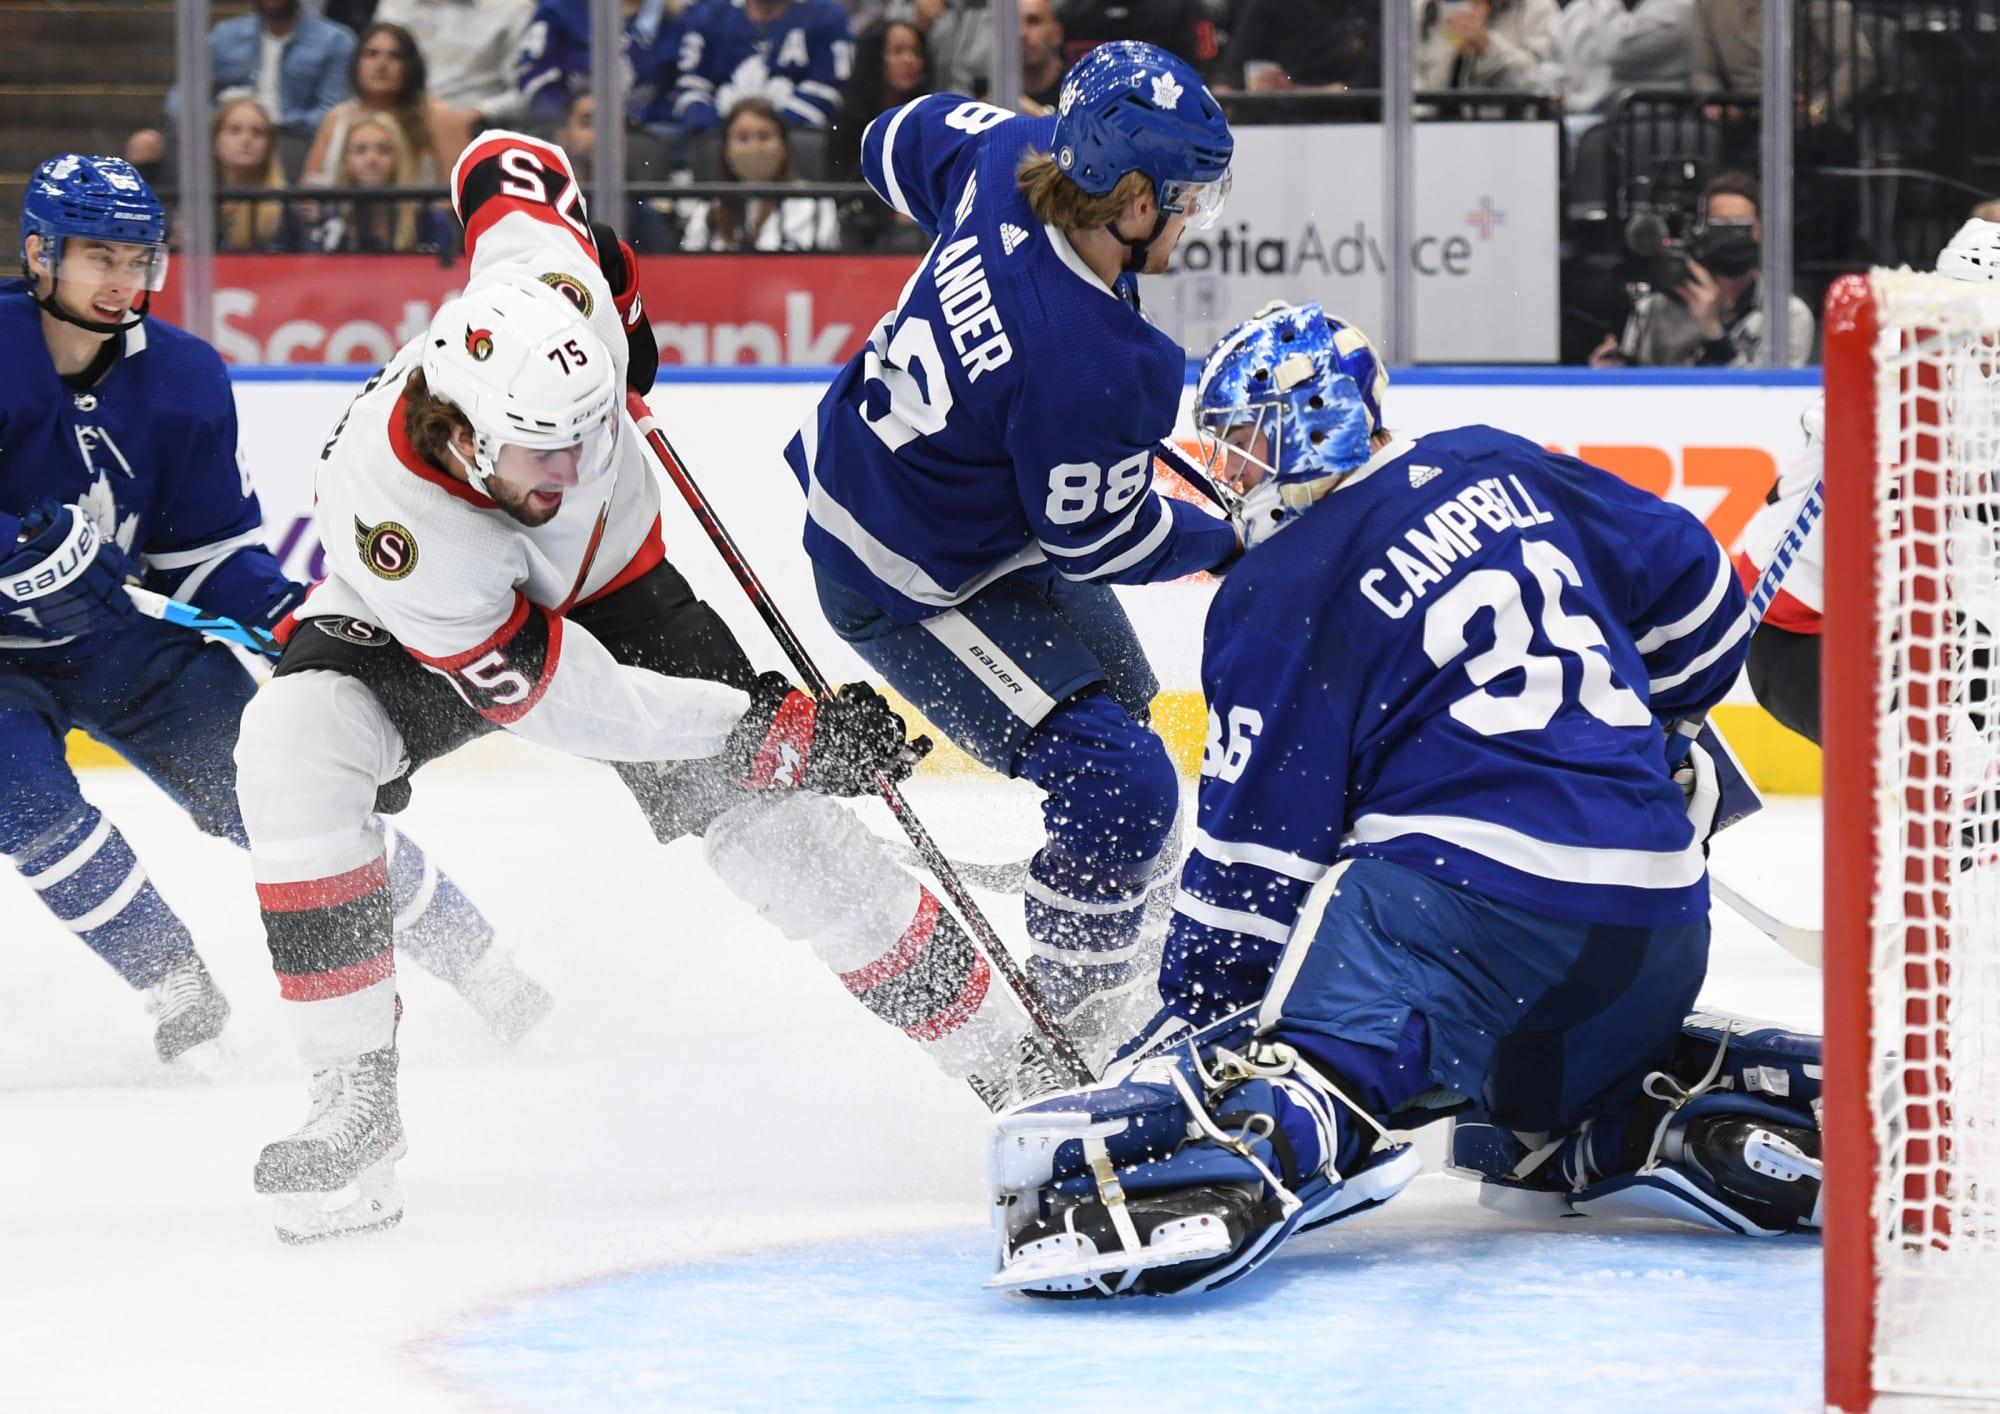 Toronto Maple Leafs: 3 Bold Predictions for the 2021-22 season